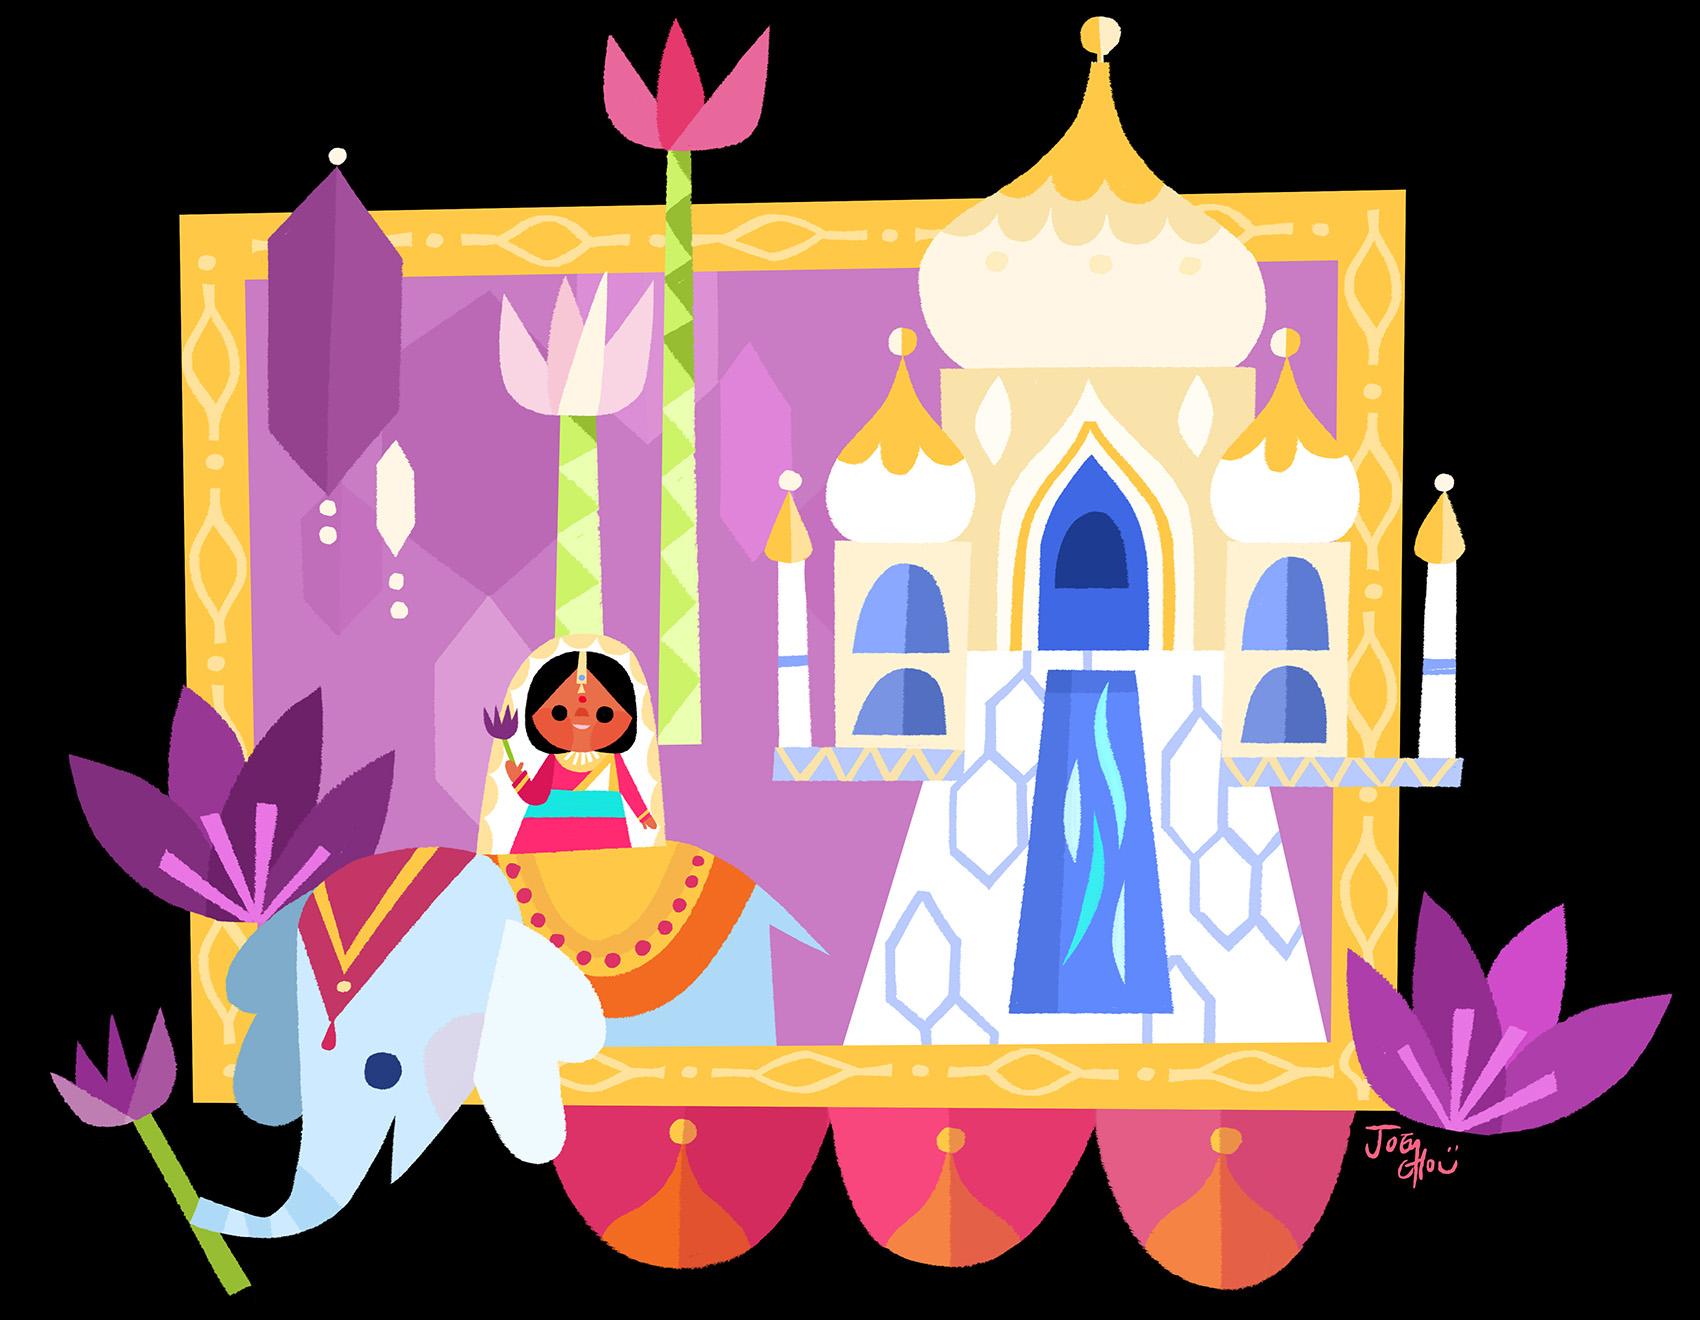 india_color_jchou_web.jpg